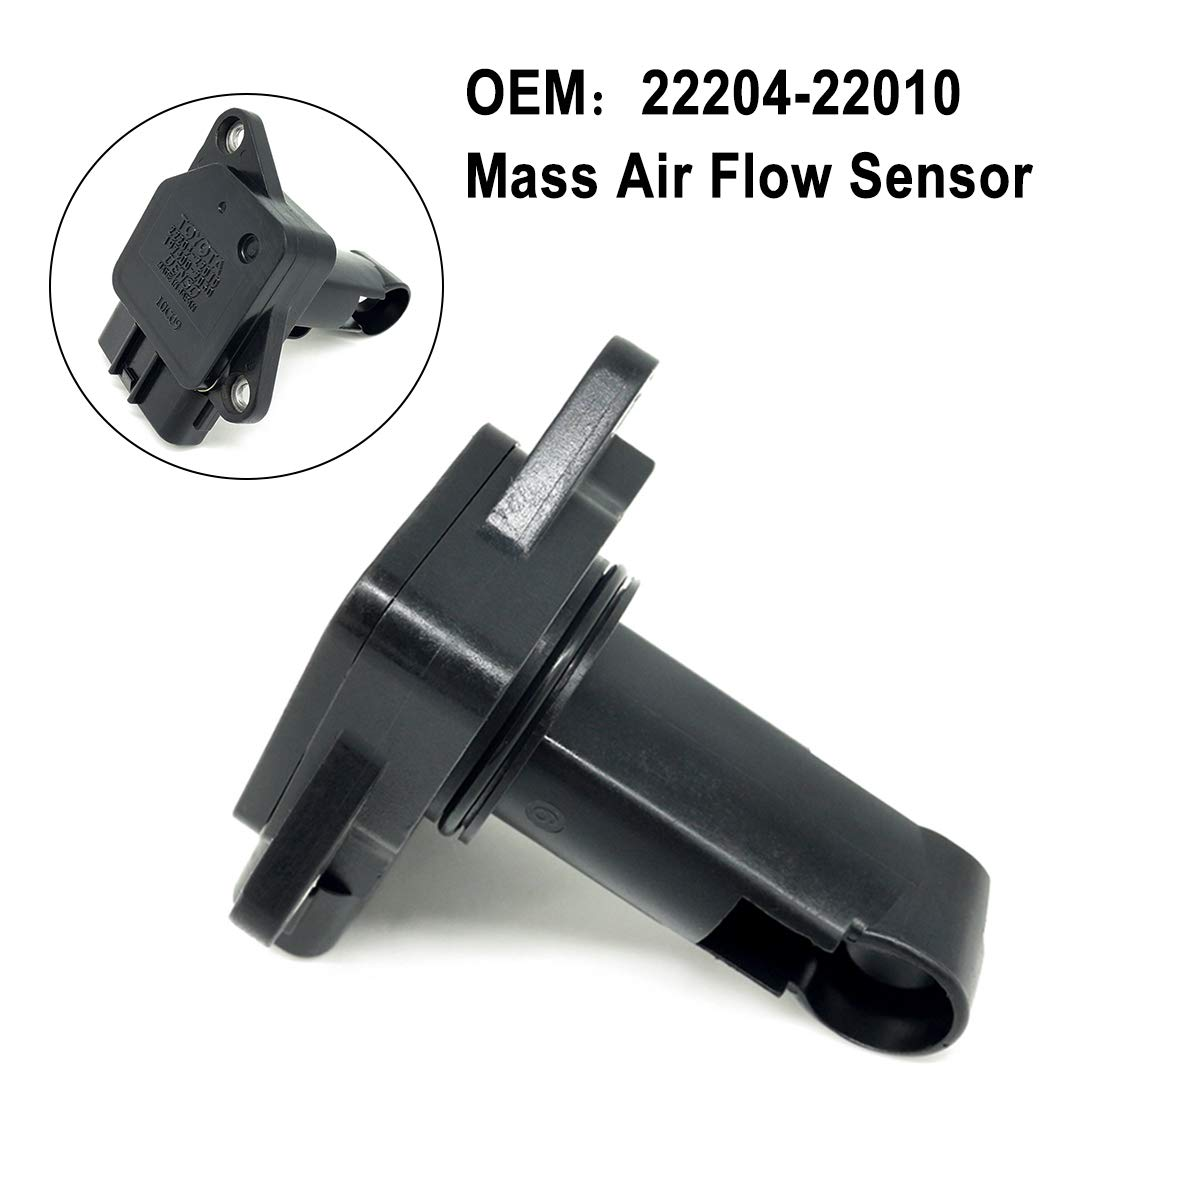 Original OEM 22204-22010 MAF Mass Air Flow Meter Sensor for Toyota Camry Lexus